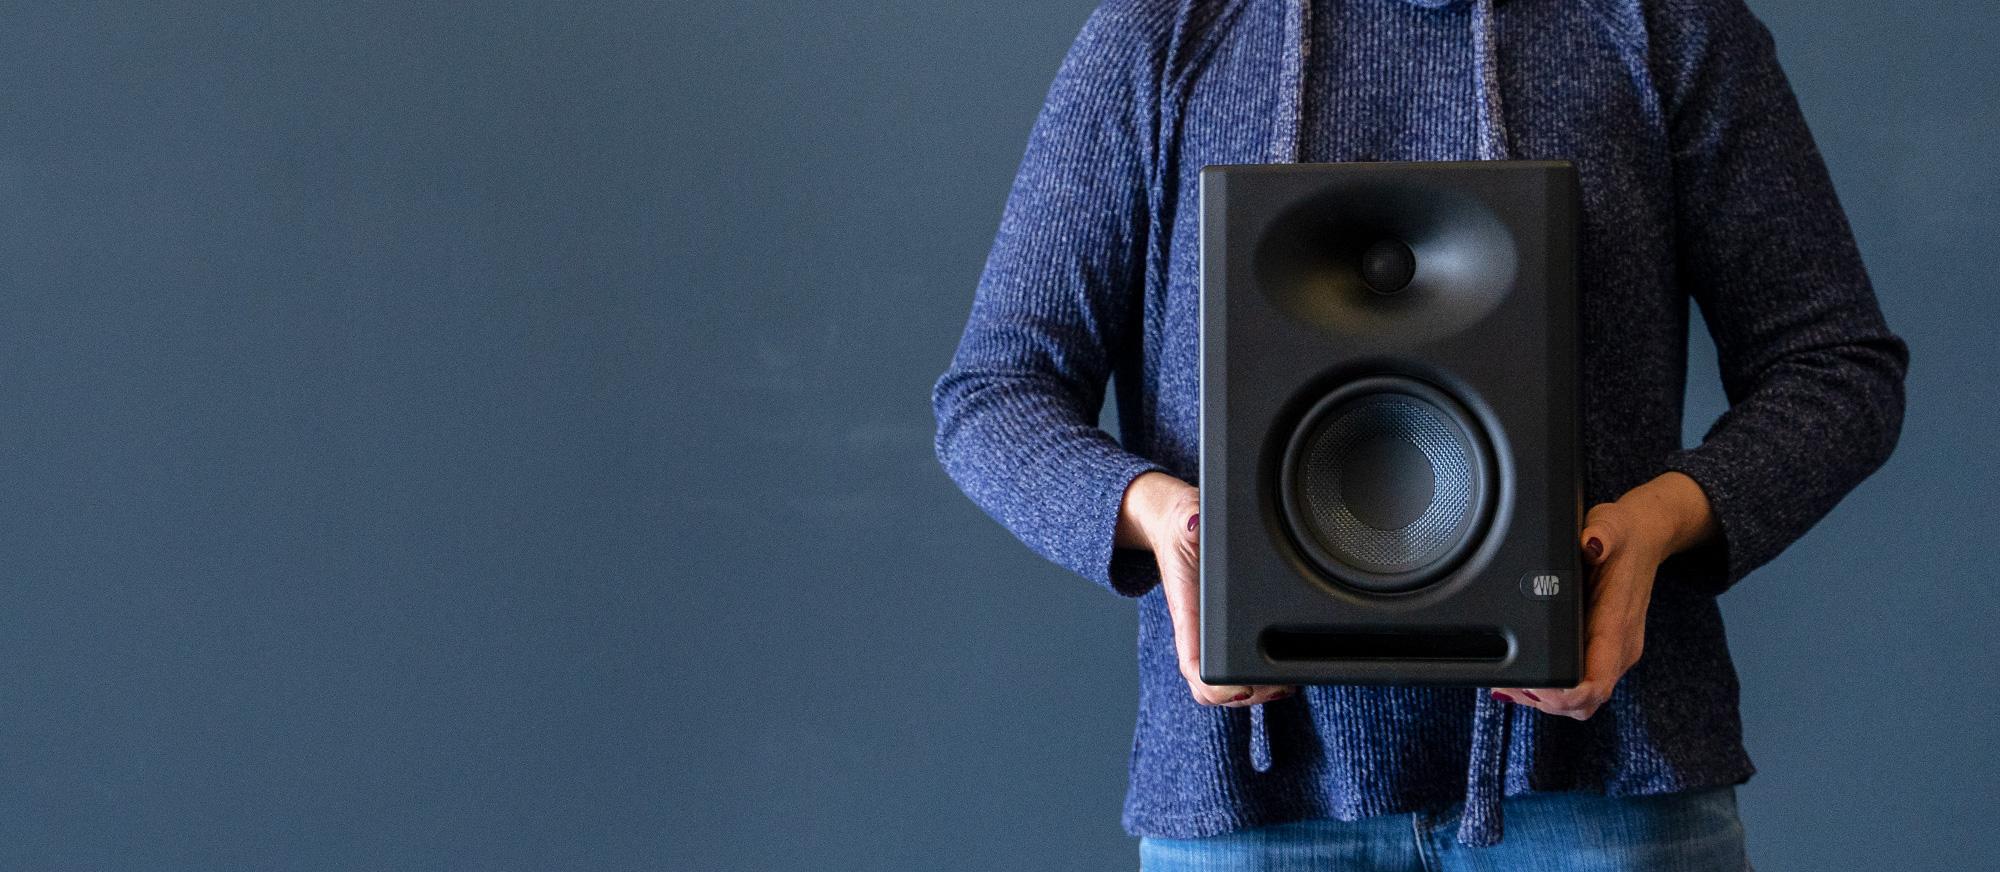 2-fach Audio Stereo-Klinkenkabel Presonus Eris E5 XT Studio Monitor 1 Paar